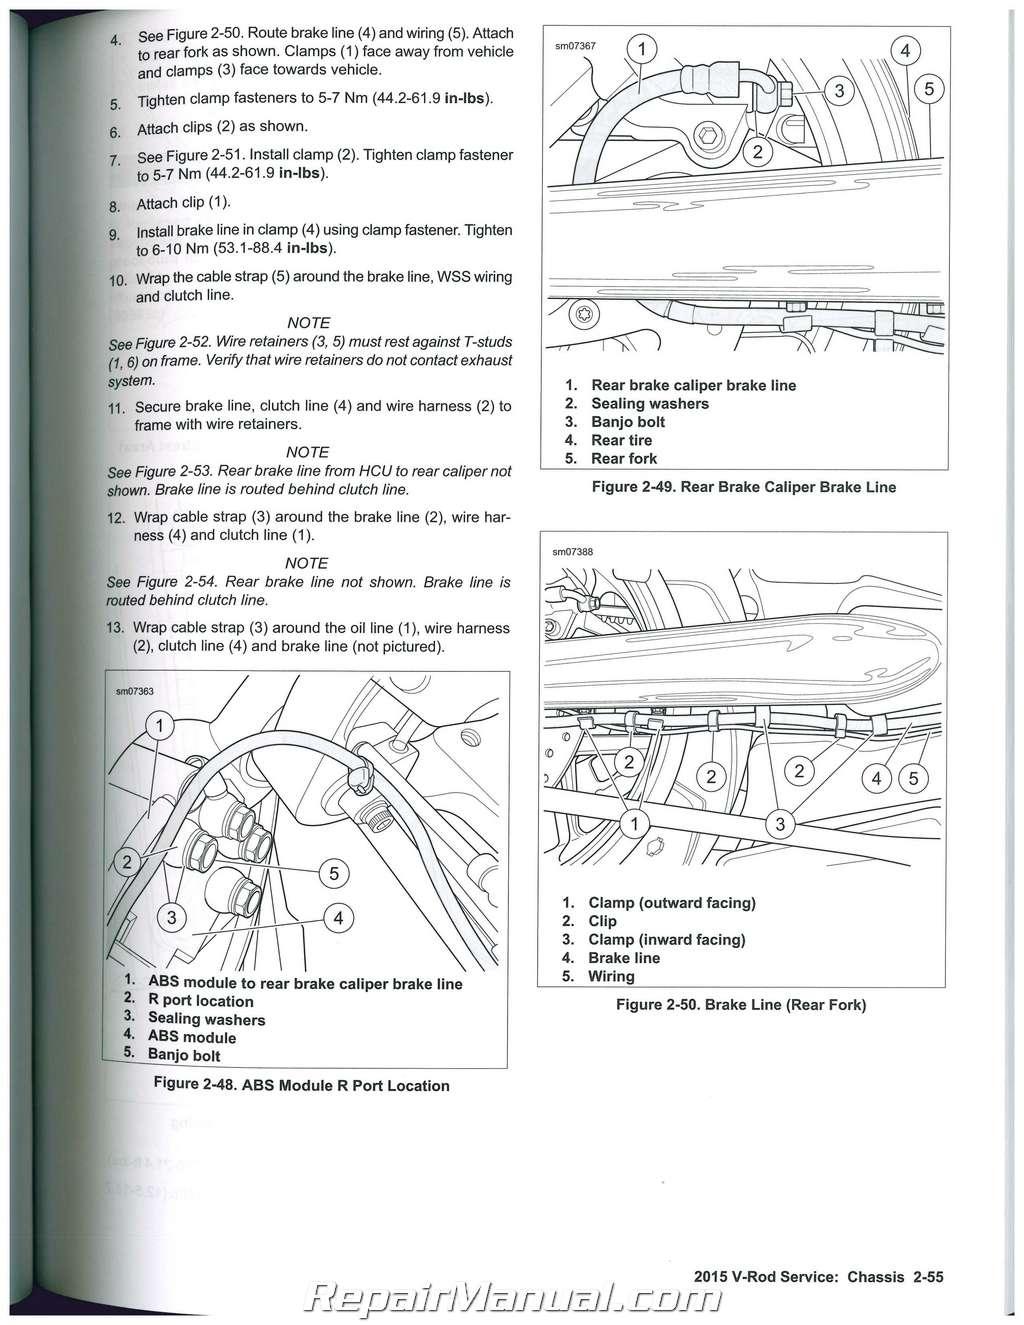 2015 harley davidson v rod motorcycle service manual rh repairmanual com 2012 v rod owners manual v rod service manual